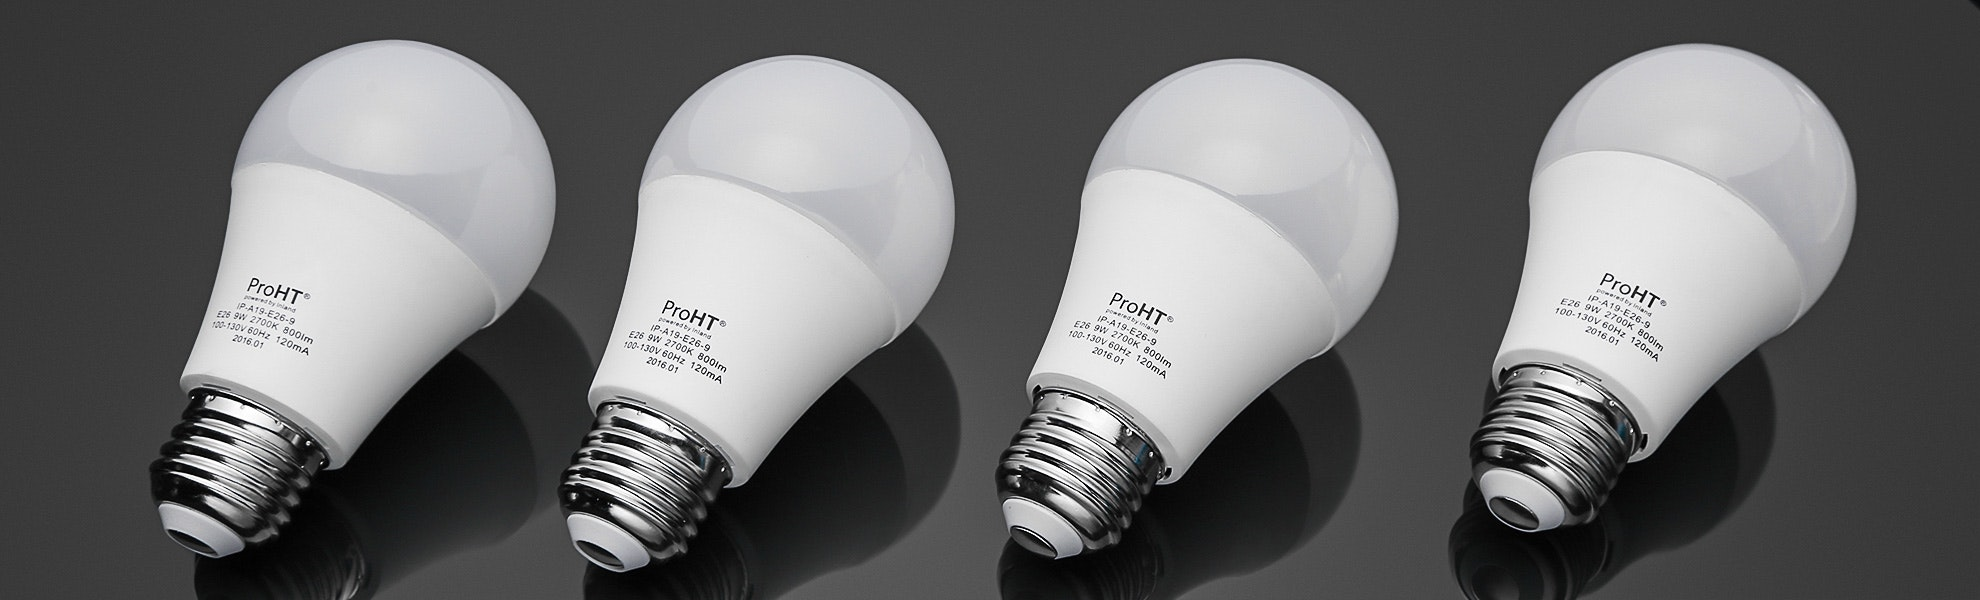 Pro HT LED A19 Soft White Light Bulbs (4-Pack)